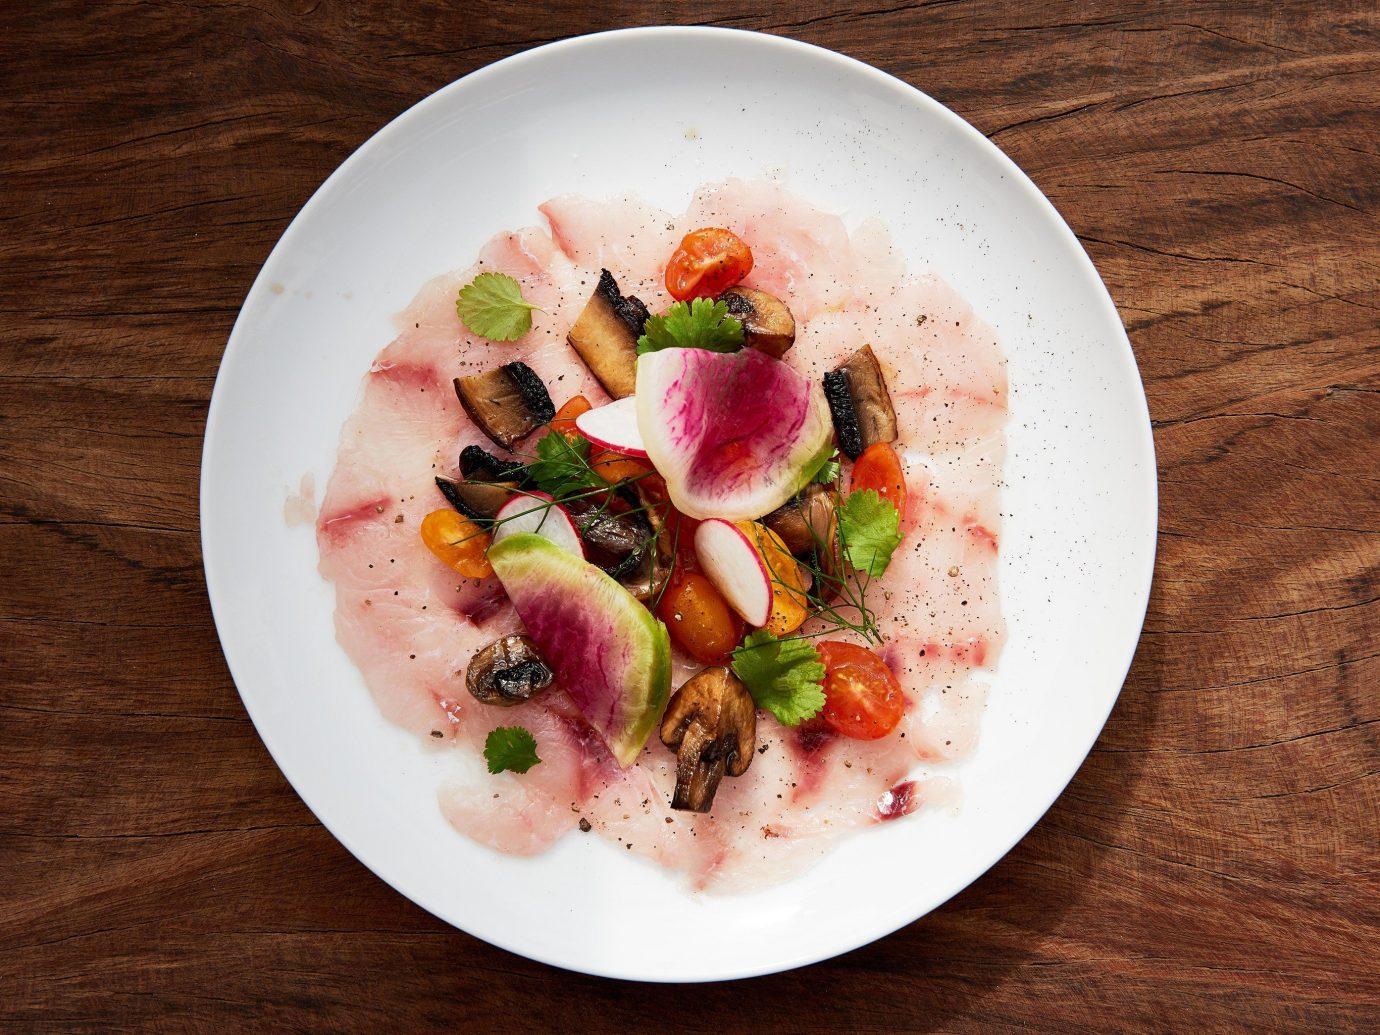 Trip Ideas plate table food dish meal produce breakfast meat cuisine wooden vegetable salad Seafood sliced